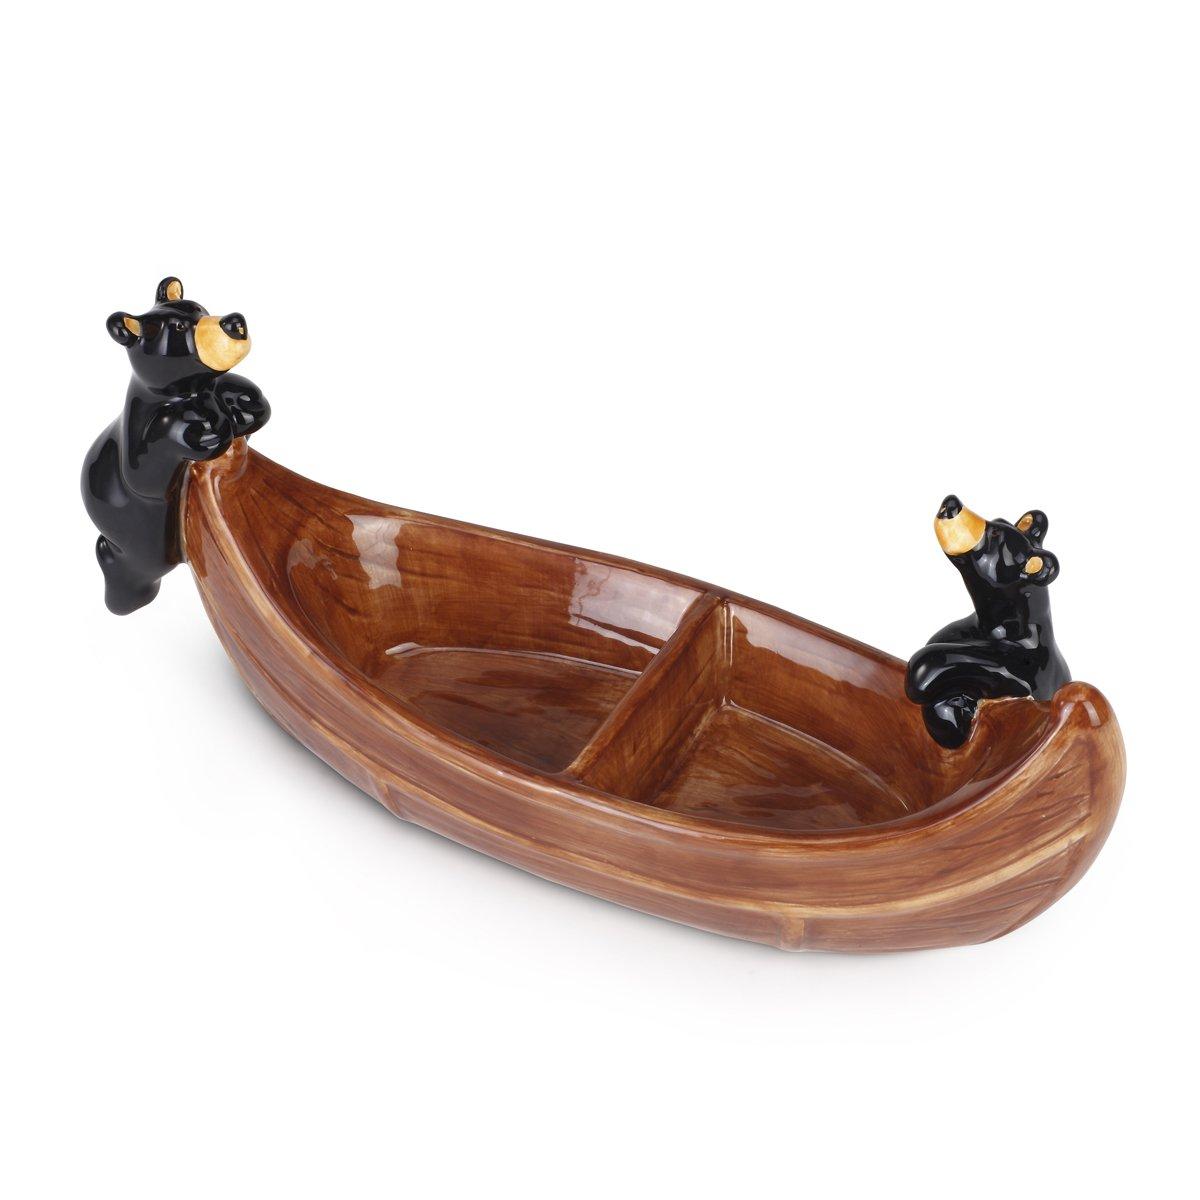 Big Sky Carvers Bear Canoe Divided Dish, Multicolor 3005080162